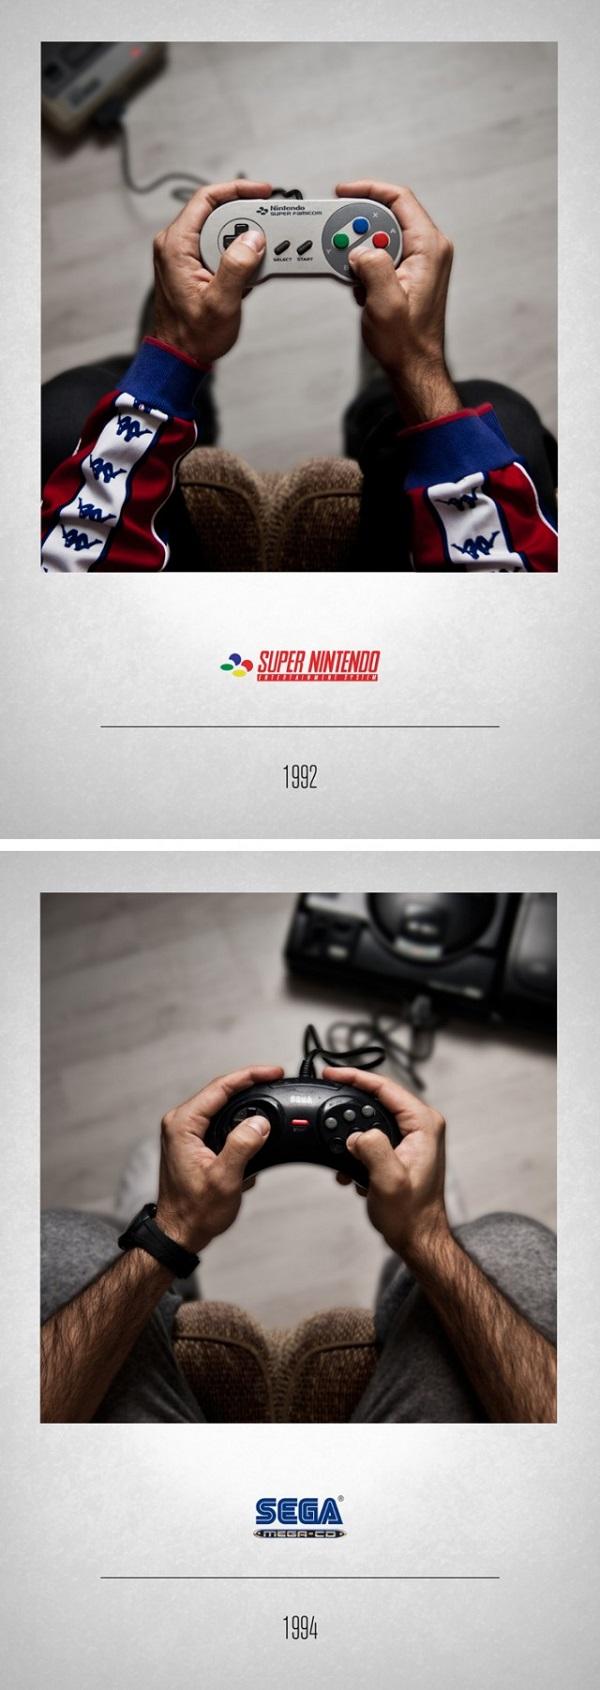 Controllers a história dos consoles